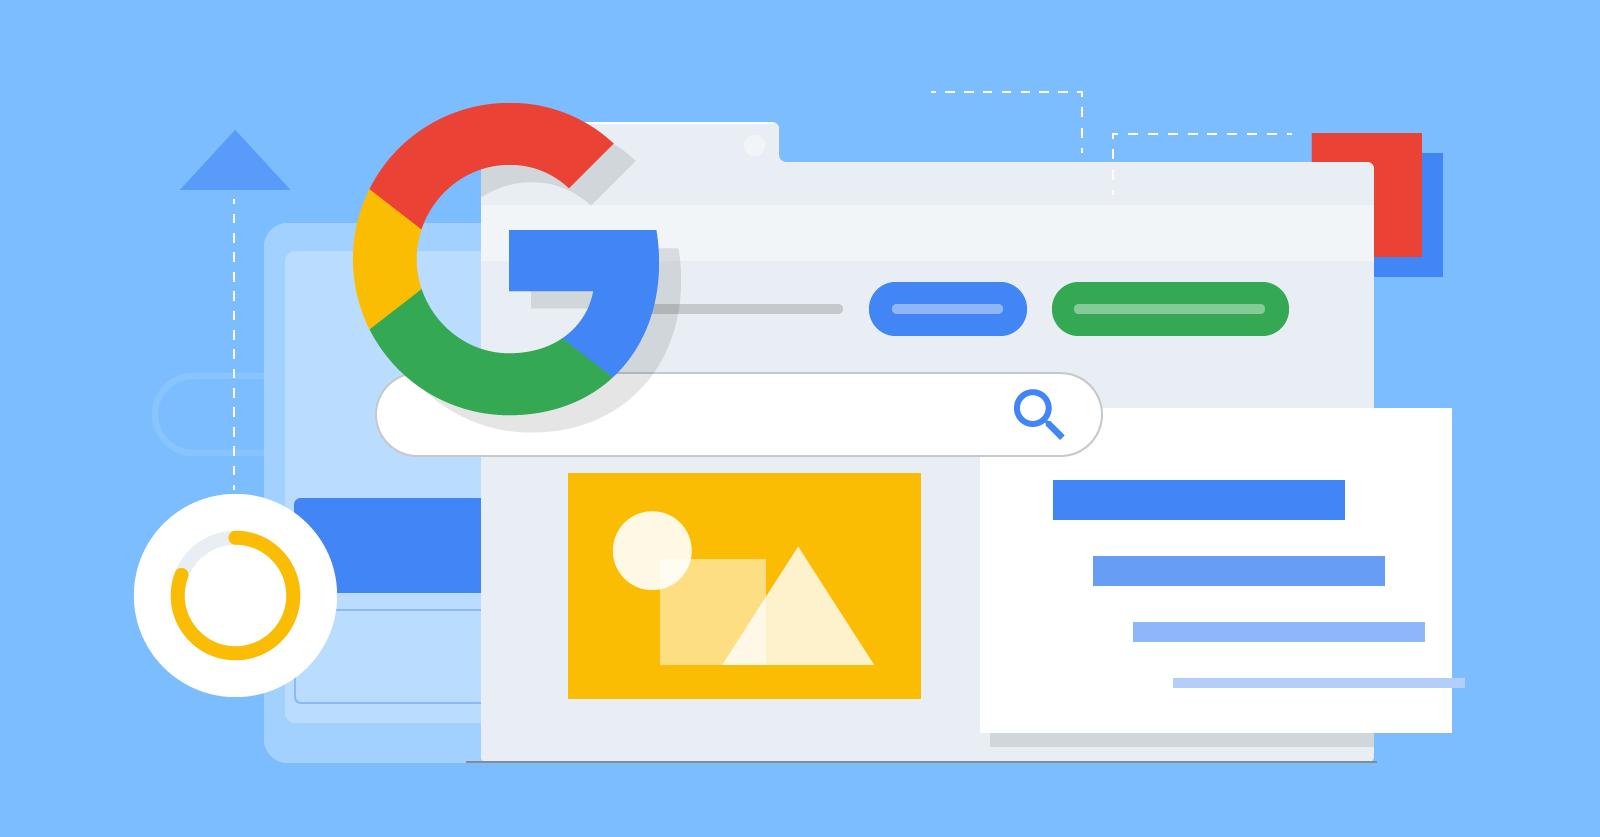 google-ranking-factors-blog-banner-images-digital-ways